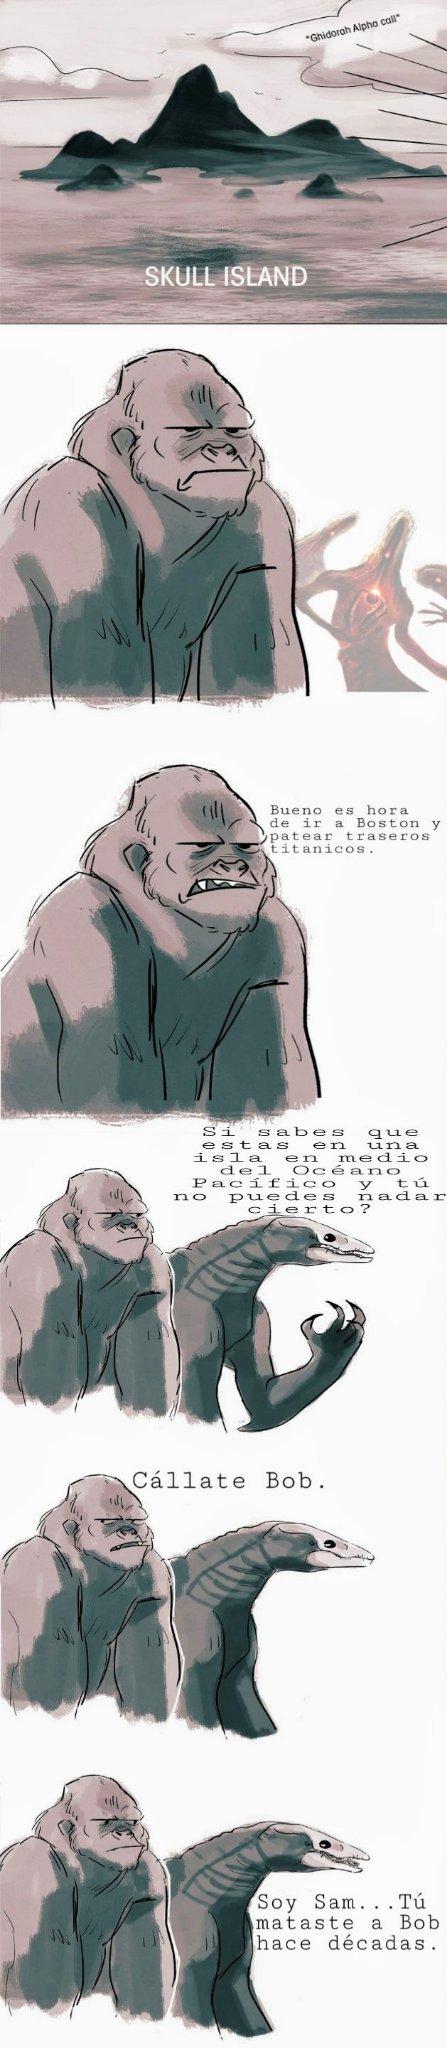 Spoiler de Godzilla KOTM. - meme